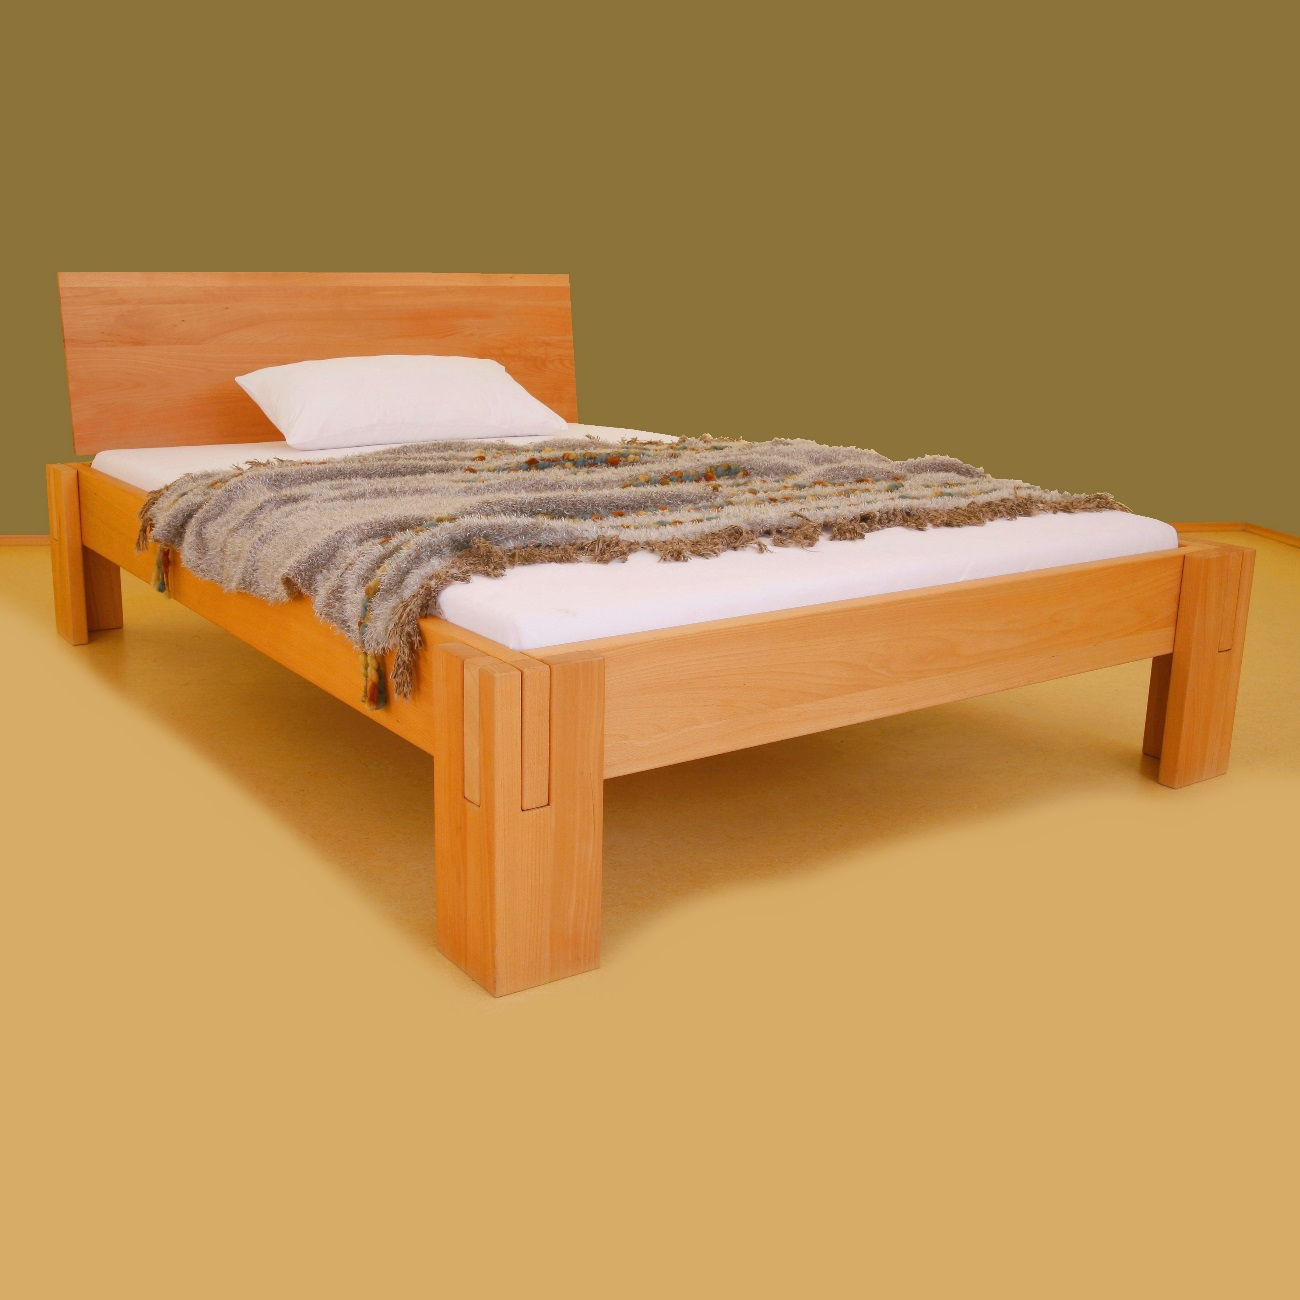 Full Size of Massivholz Bett Selber Bauen Obi 200x200 Bettgestell 140x200 Betten Massivholzbettgestell Paroswood Eiche Massivholzbett Stabiles Massives Fr Bergewichtige Und Bett Massivholz Bett